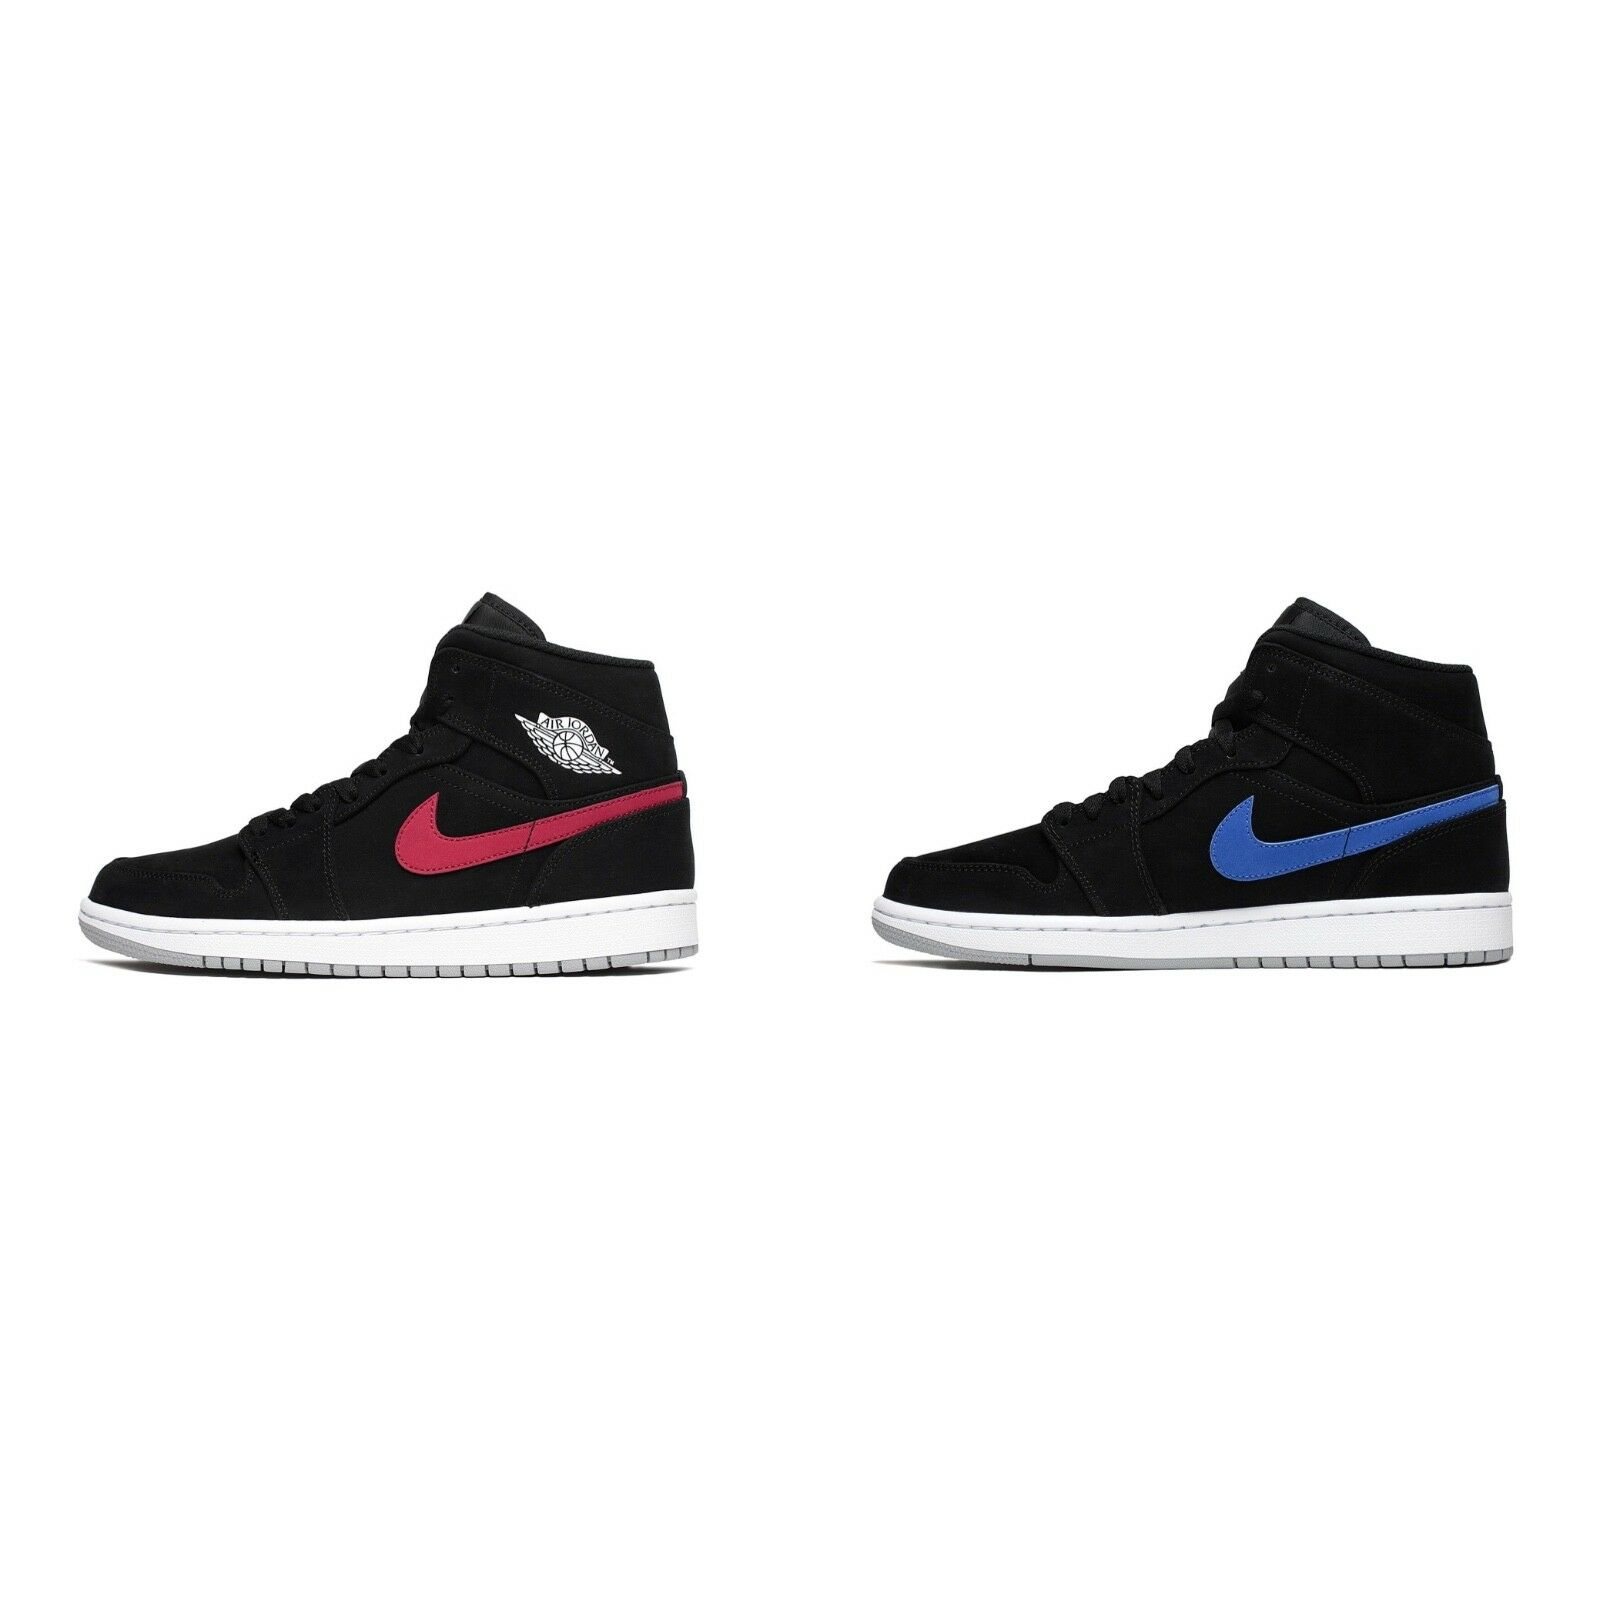 Nike Air Black Jordan Retro 1 Mid Black Air University Red Blue 554724-065 Size 8-13 d21afc